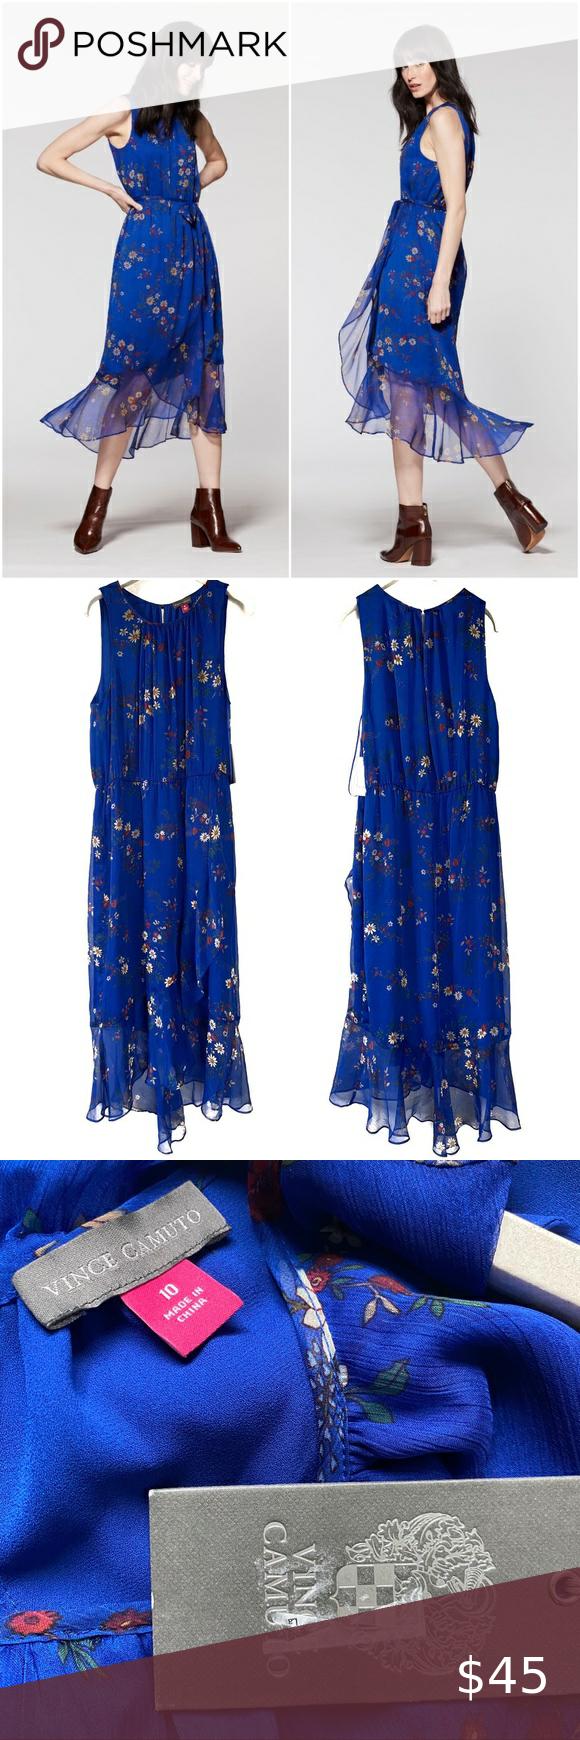 Vince Camuto Bouquet Print Maxi Dress 10 Printed Maxi Dress Maxi Dress Printed Maxi [ 1740 x 580 Pixel ]